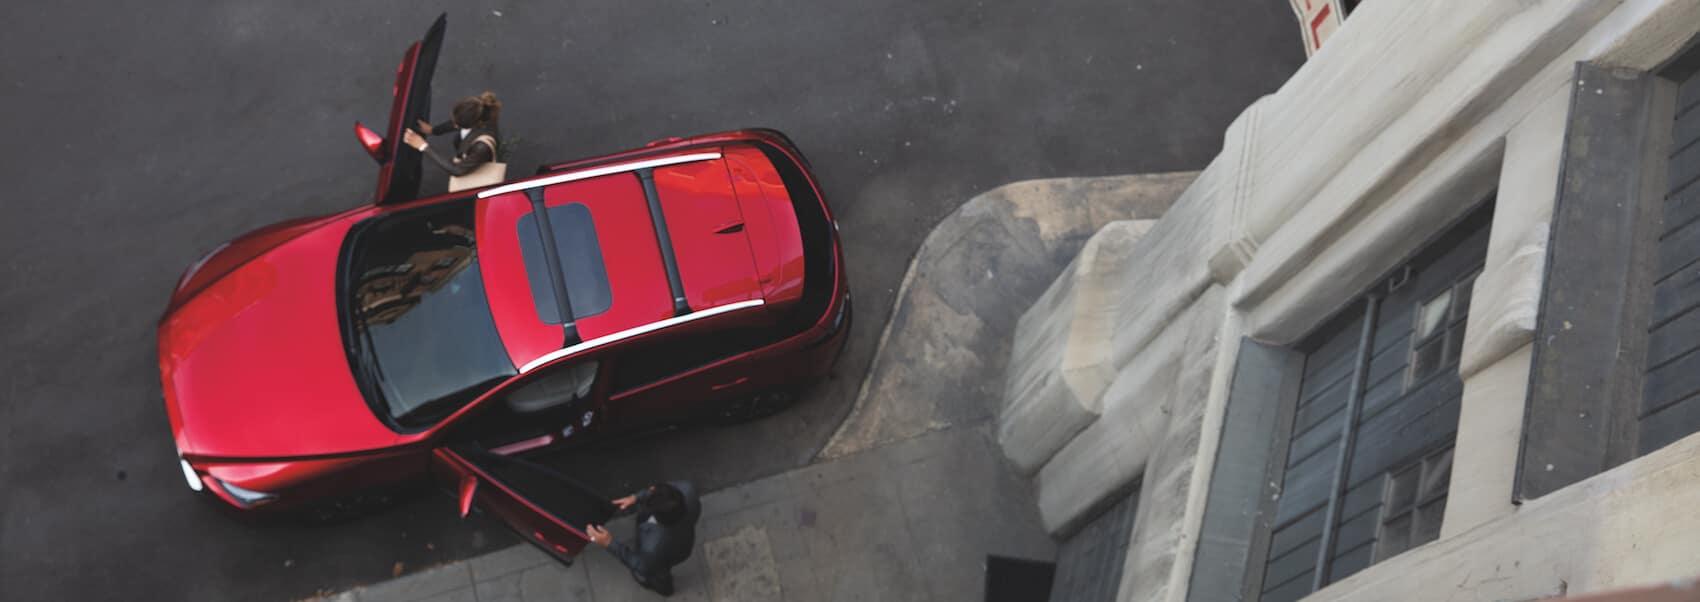 Mazda CX-3 Seating & Capacities